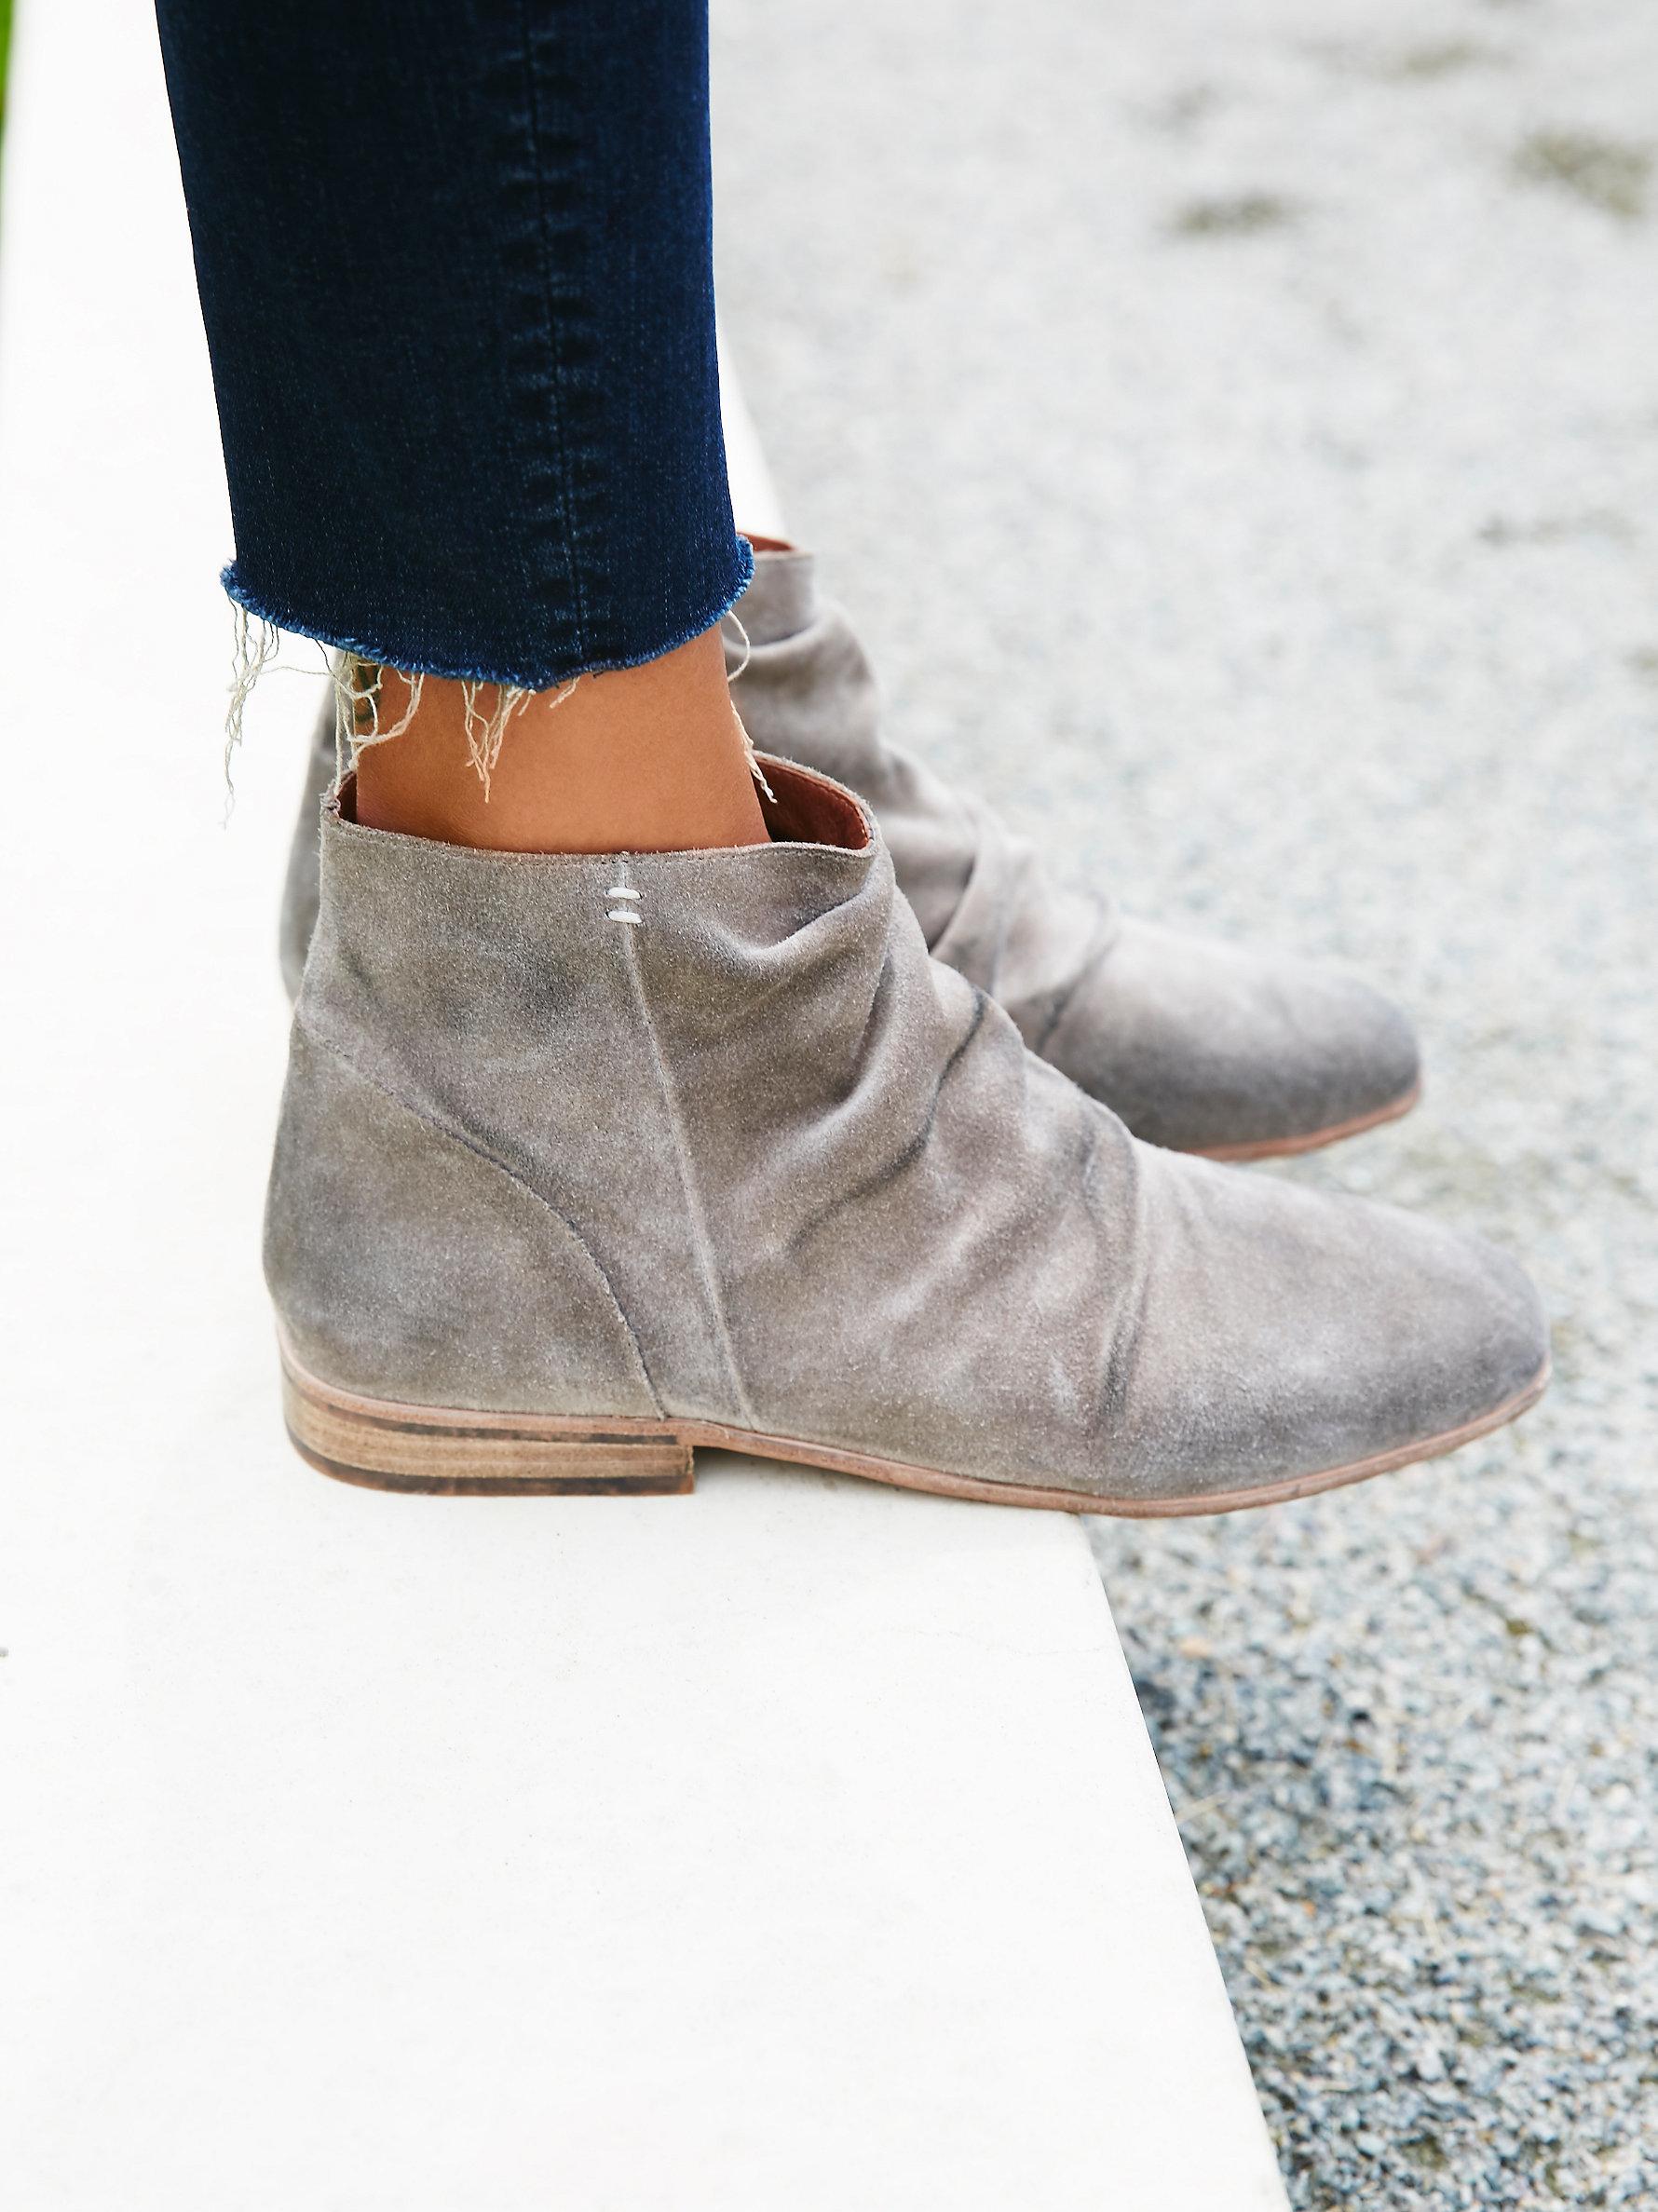 Free Boot